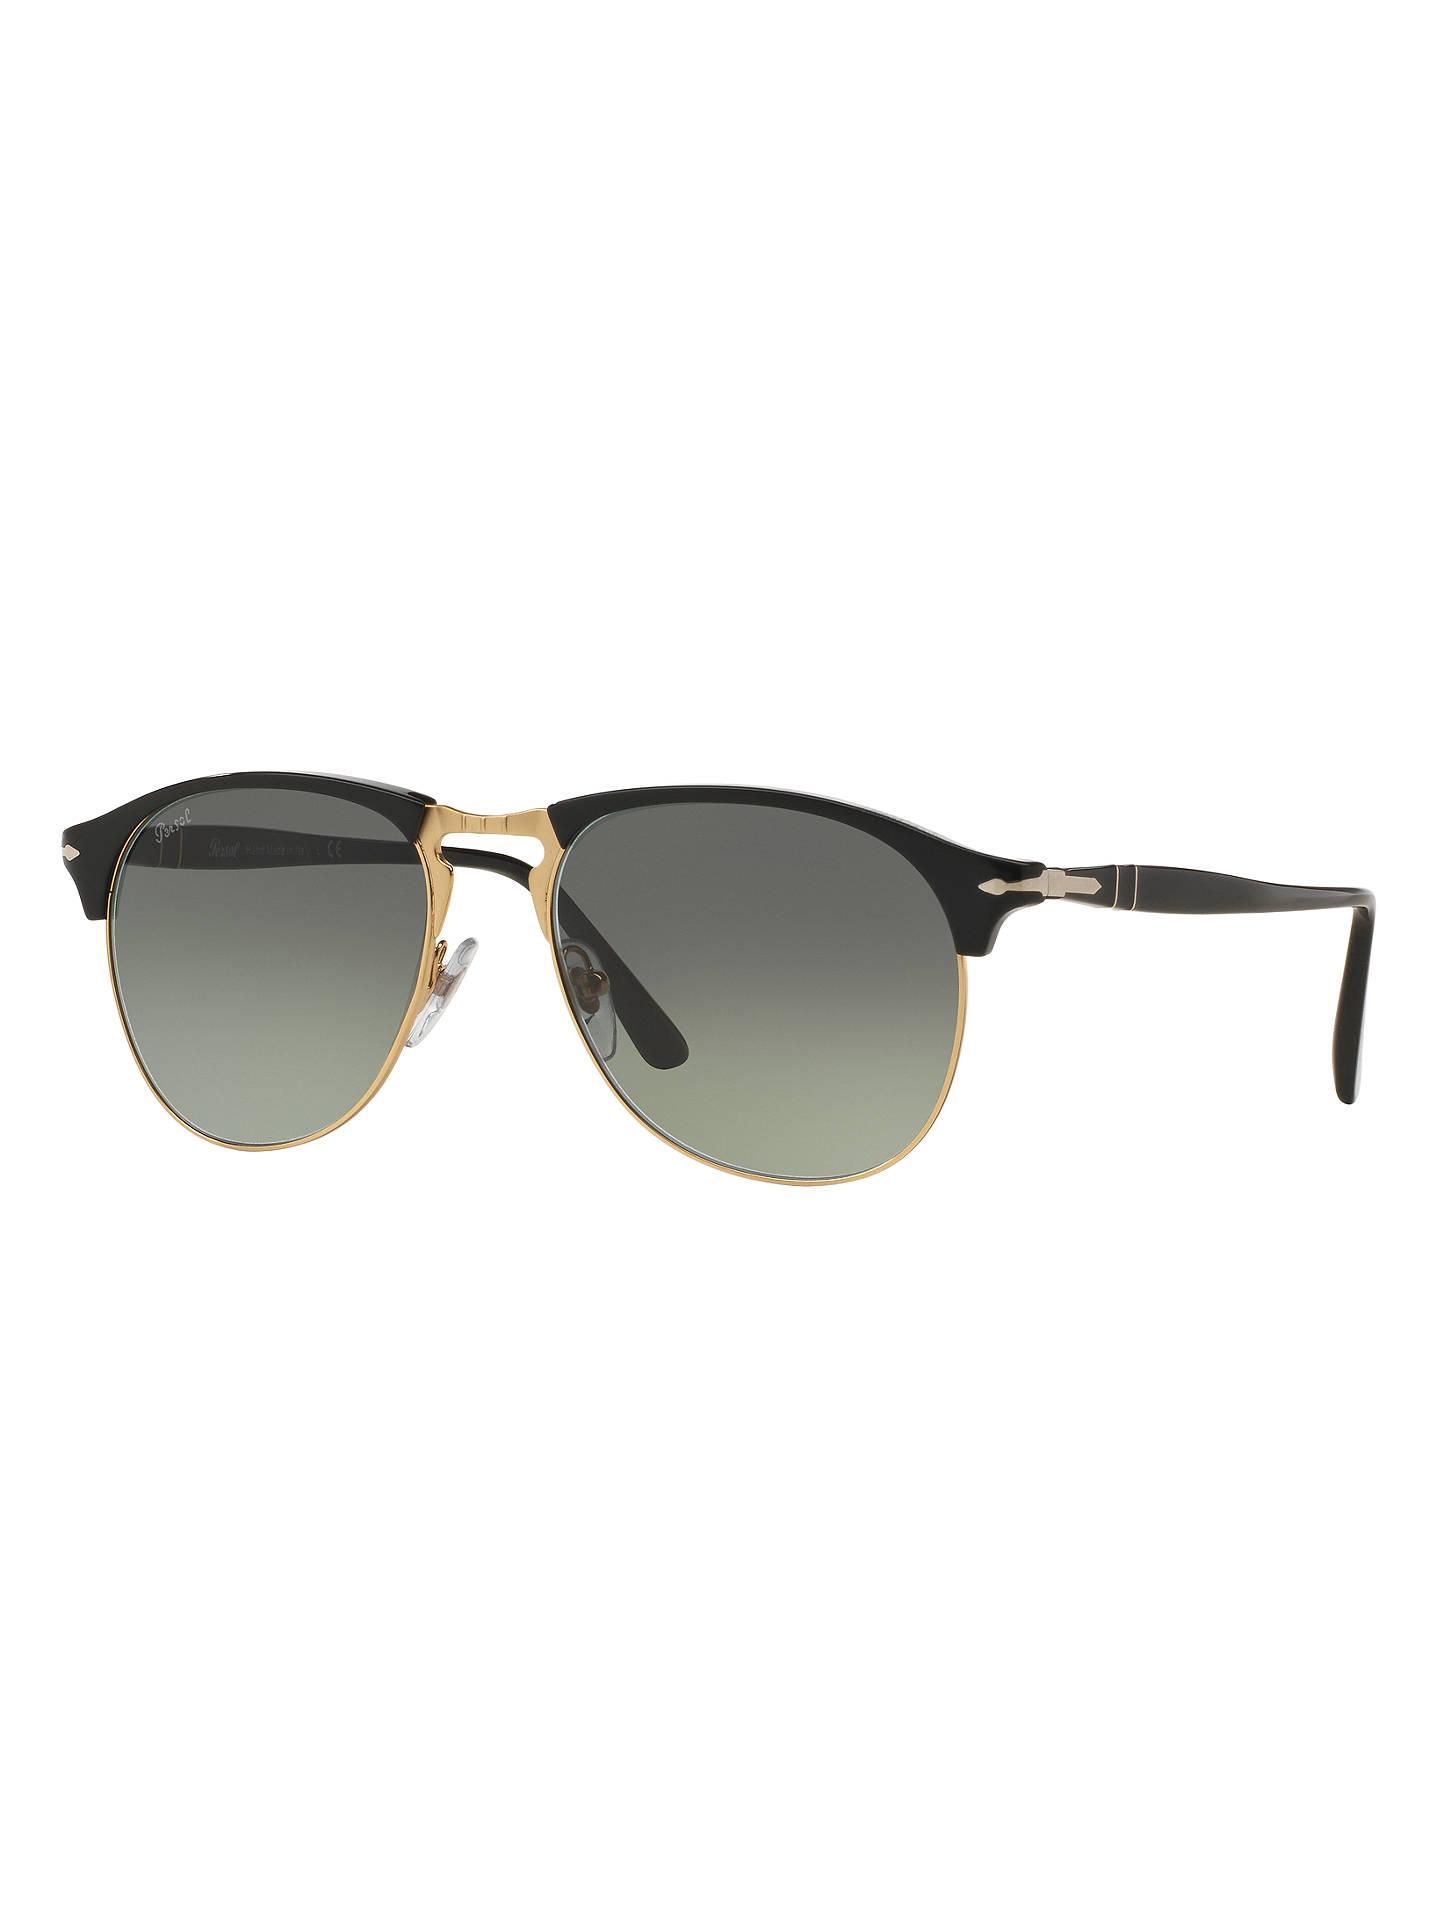 b38f3f4752 Buy Persol PO8649S Aviator Sunglasses